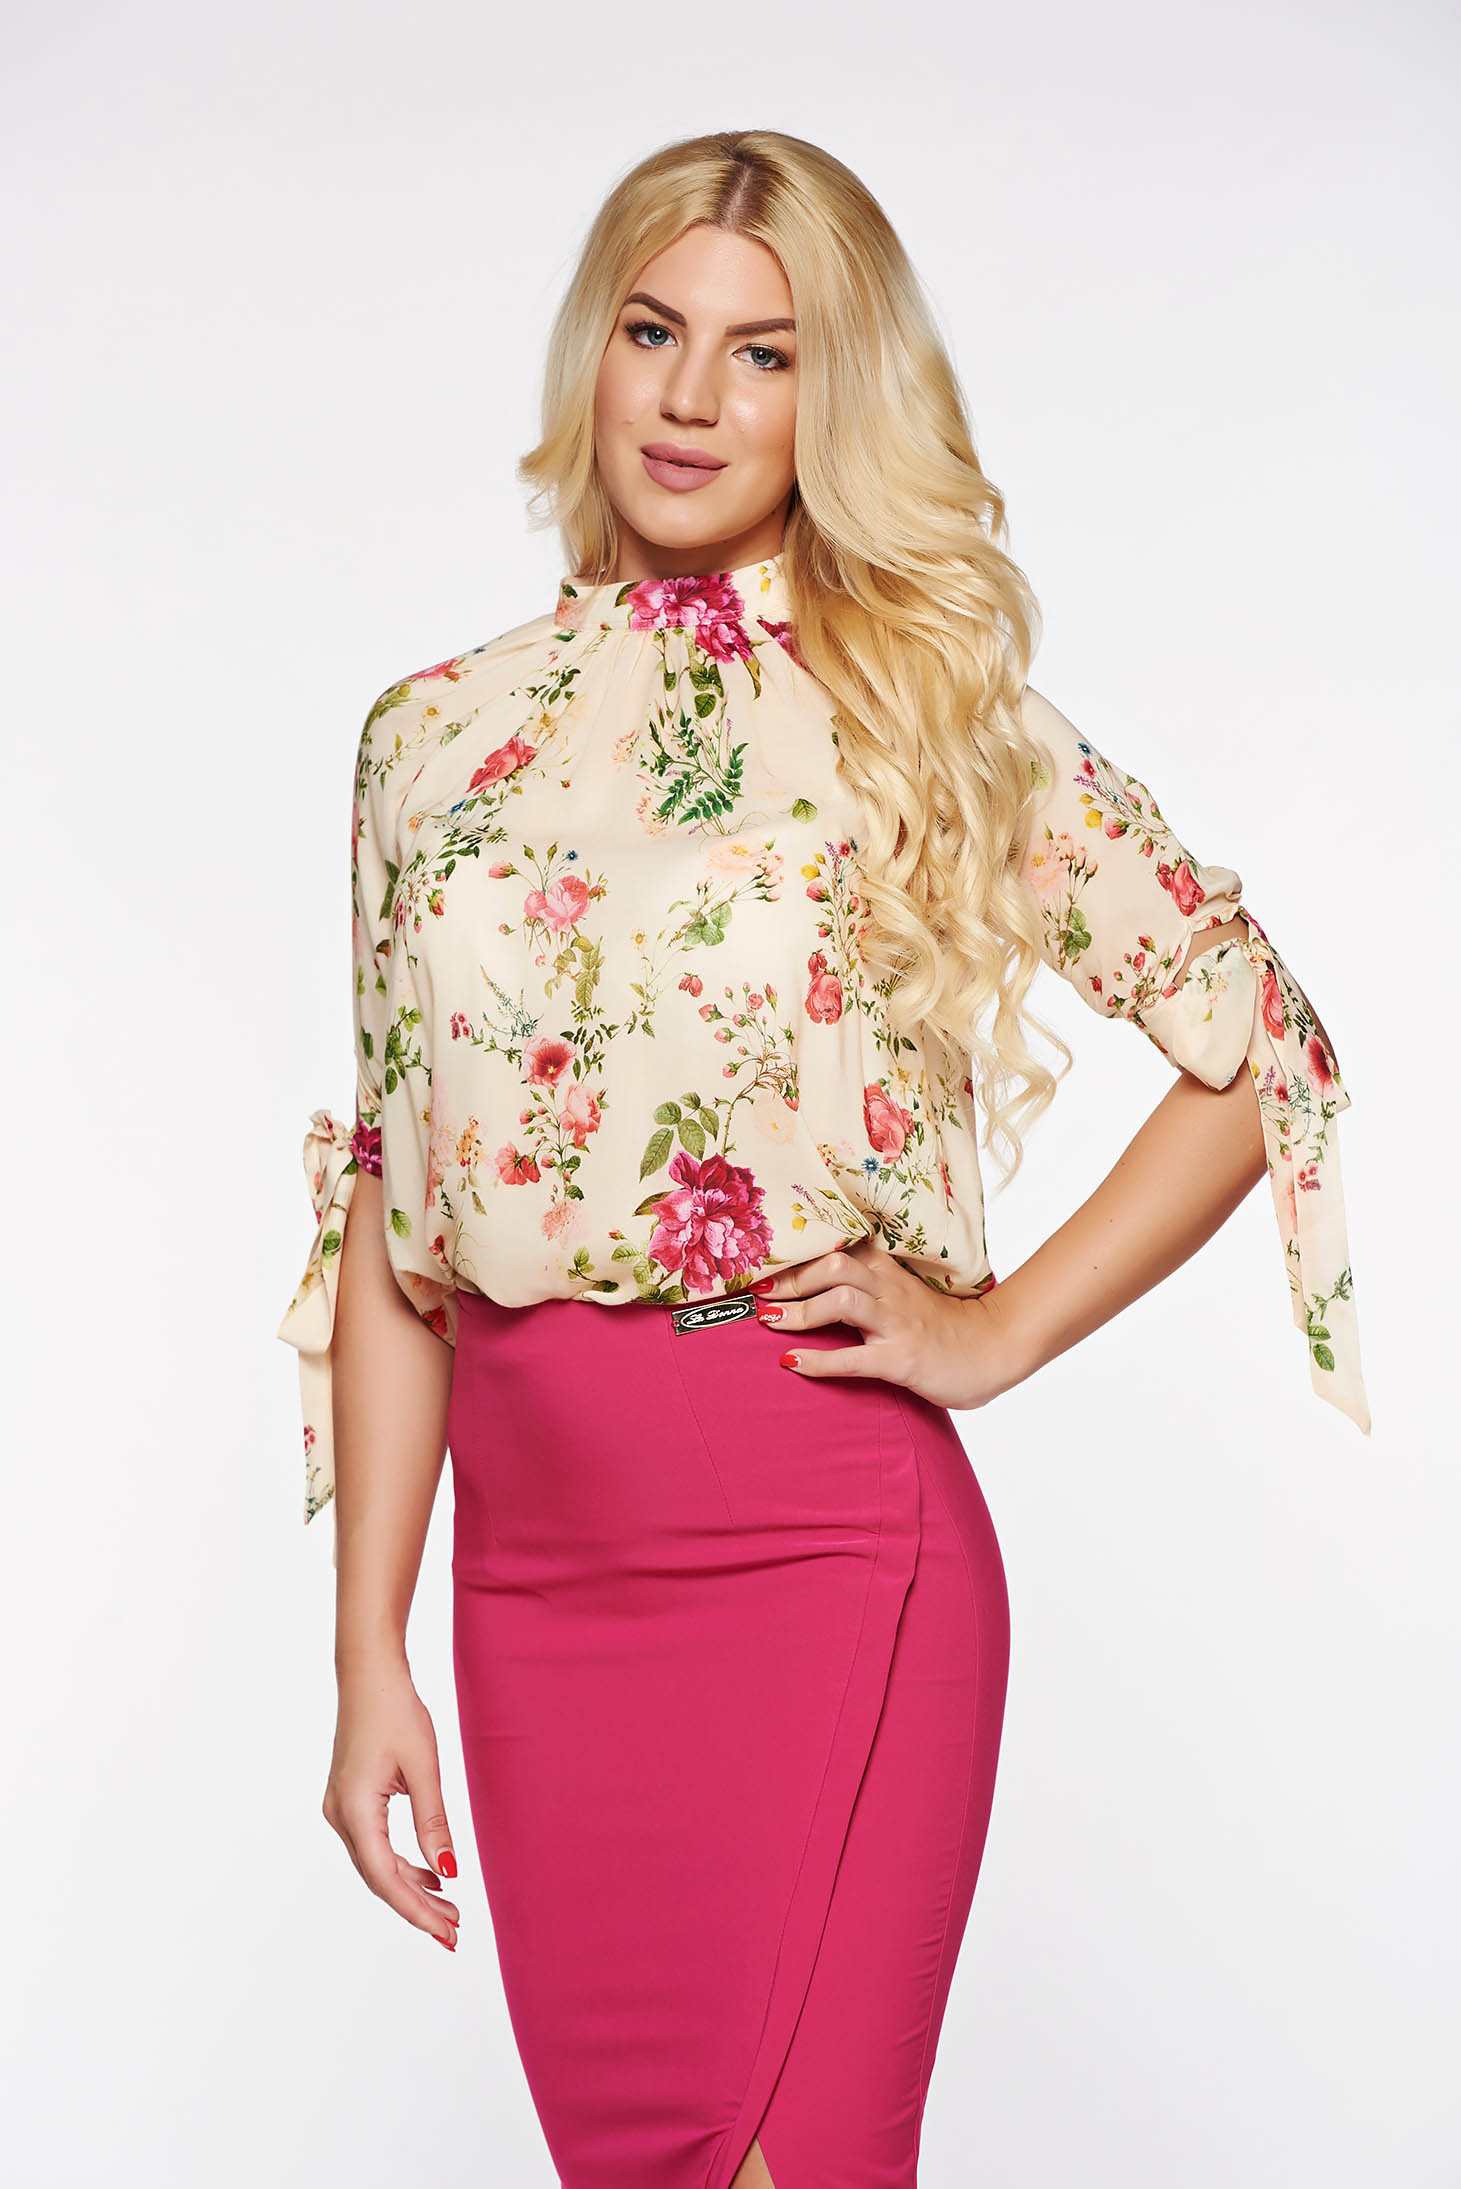 PrettyGirl cream elegant flared women`s blouse transparent chiffon fabric with floral prints